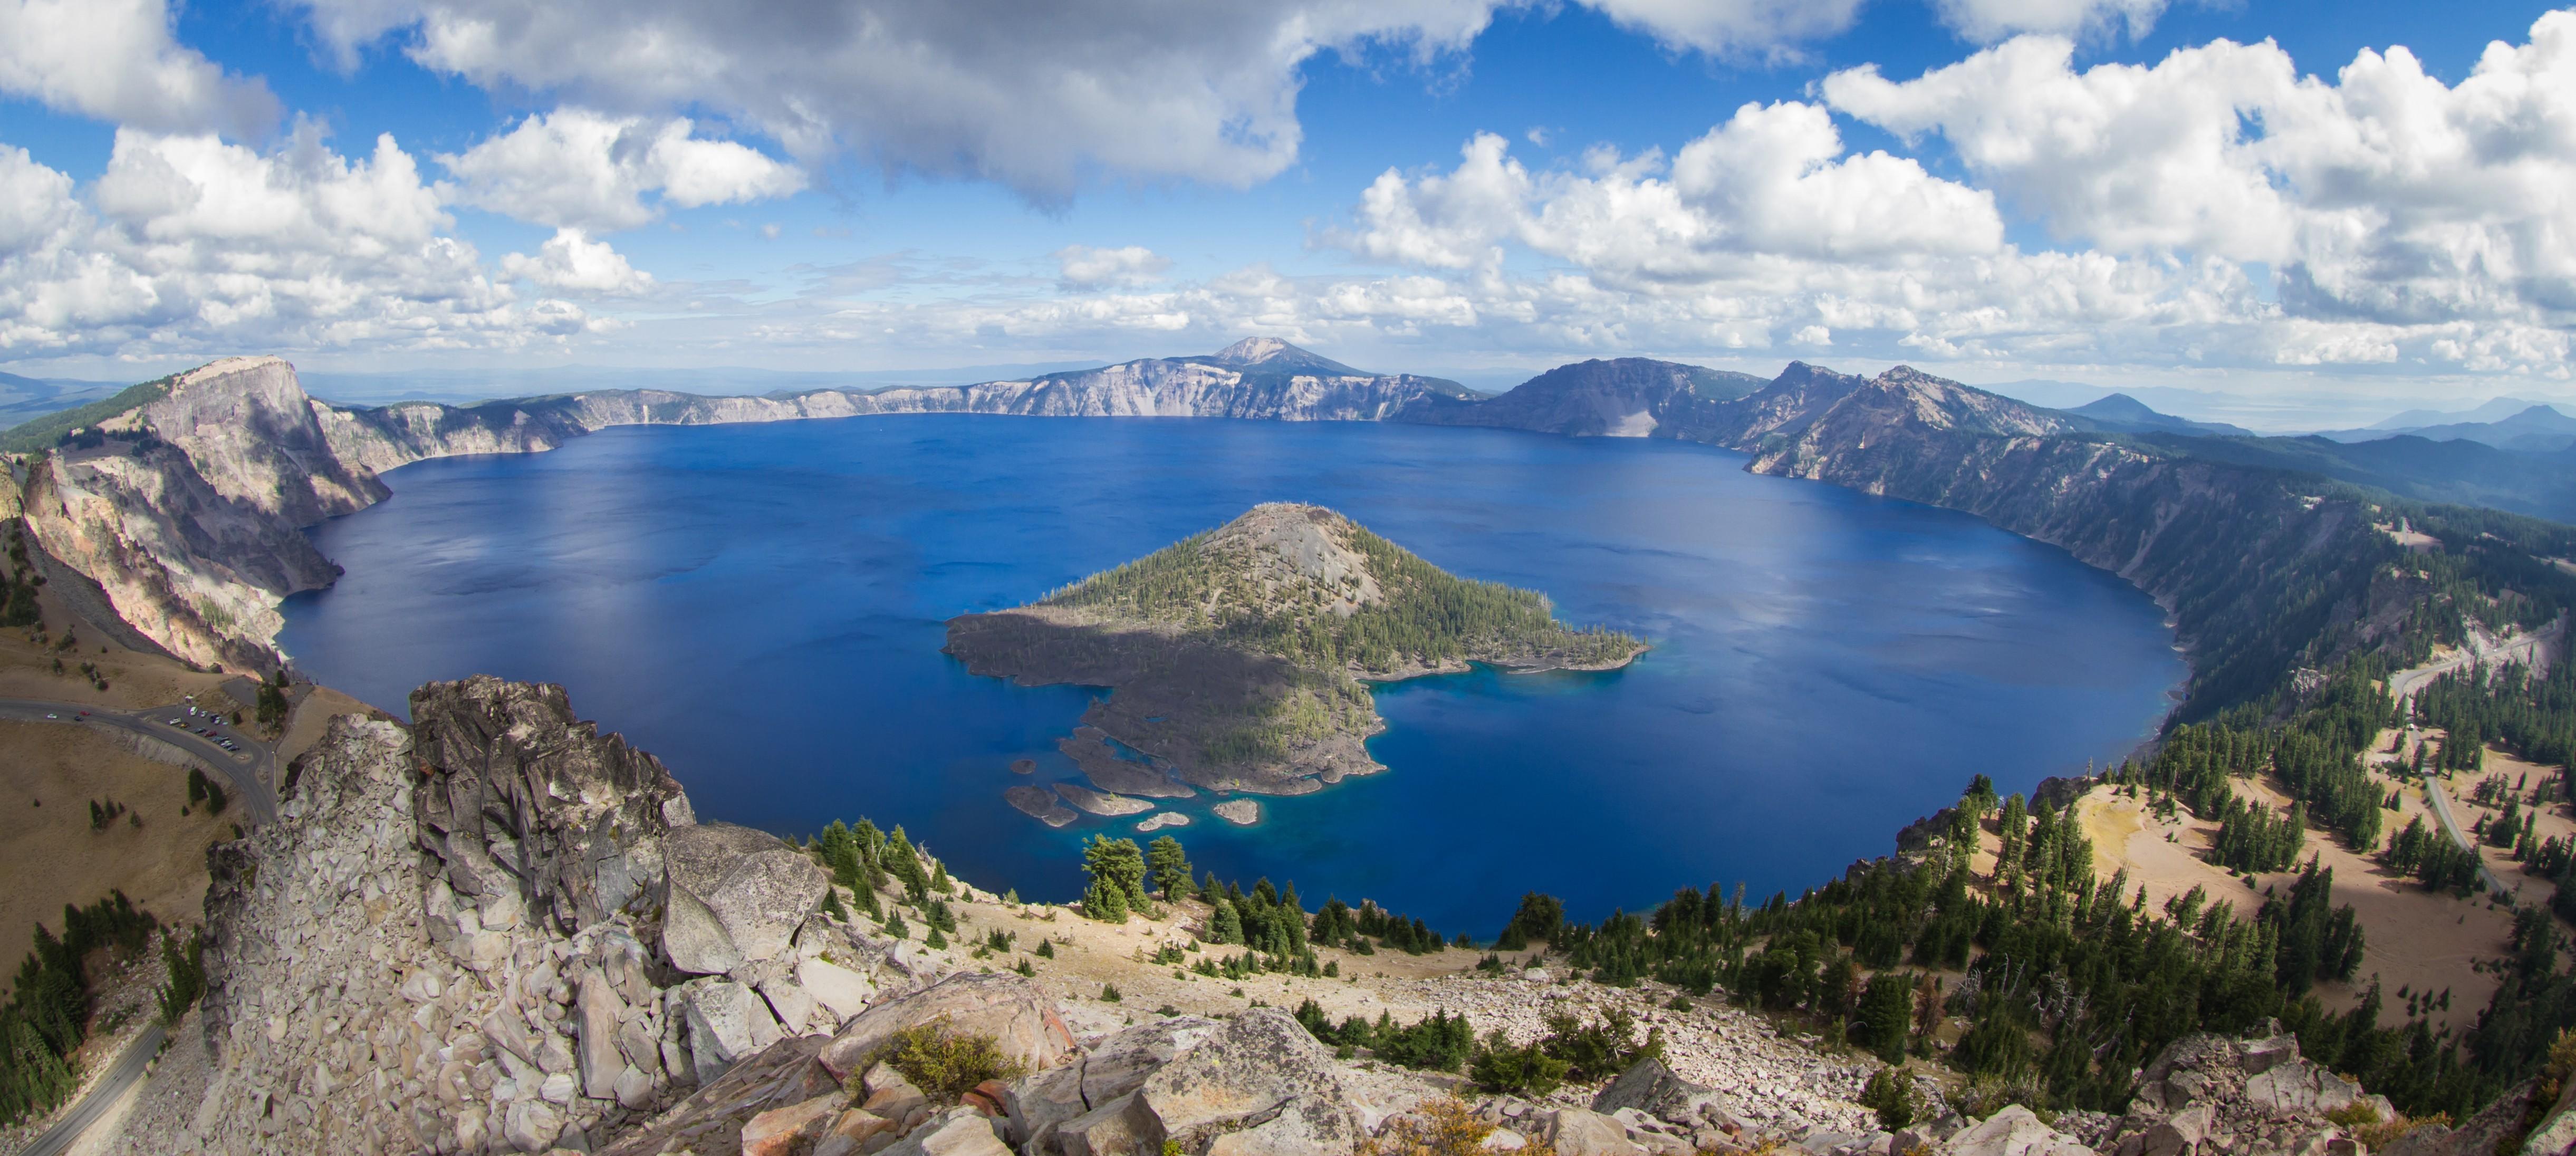 Wallpaper crater lake usa mountain nature 4k nature for Wallpaper home usa